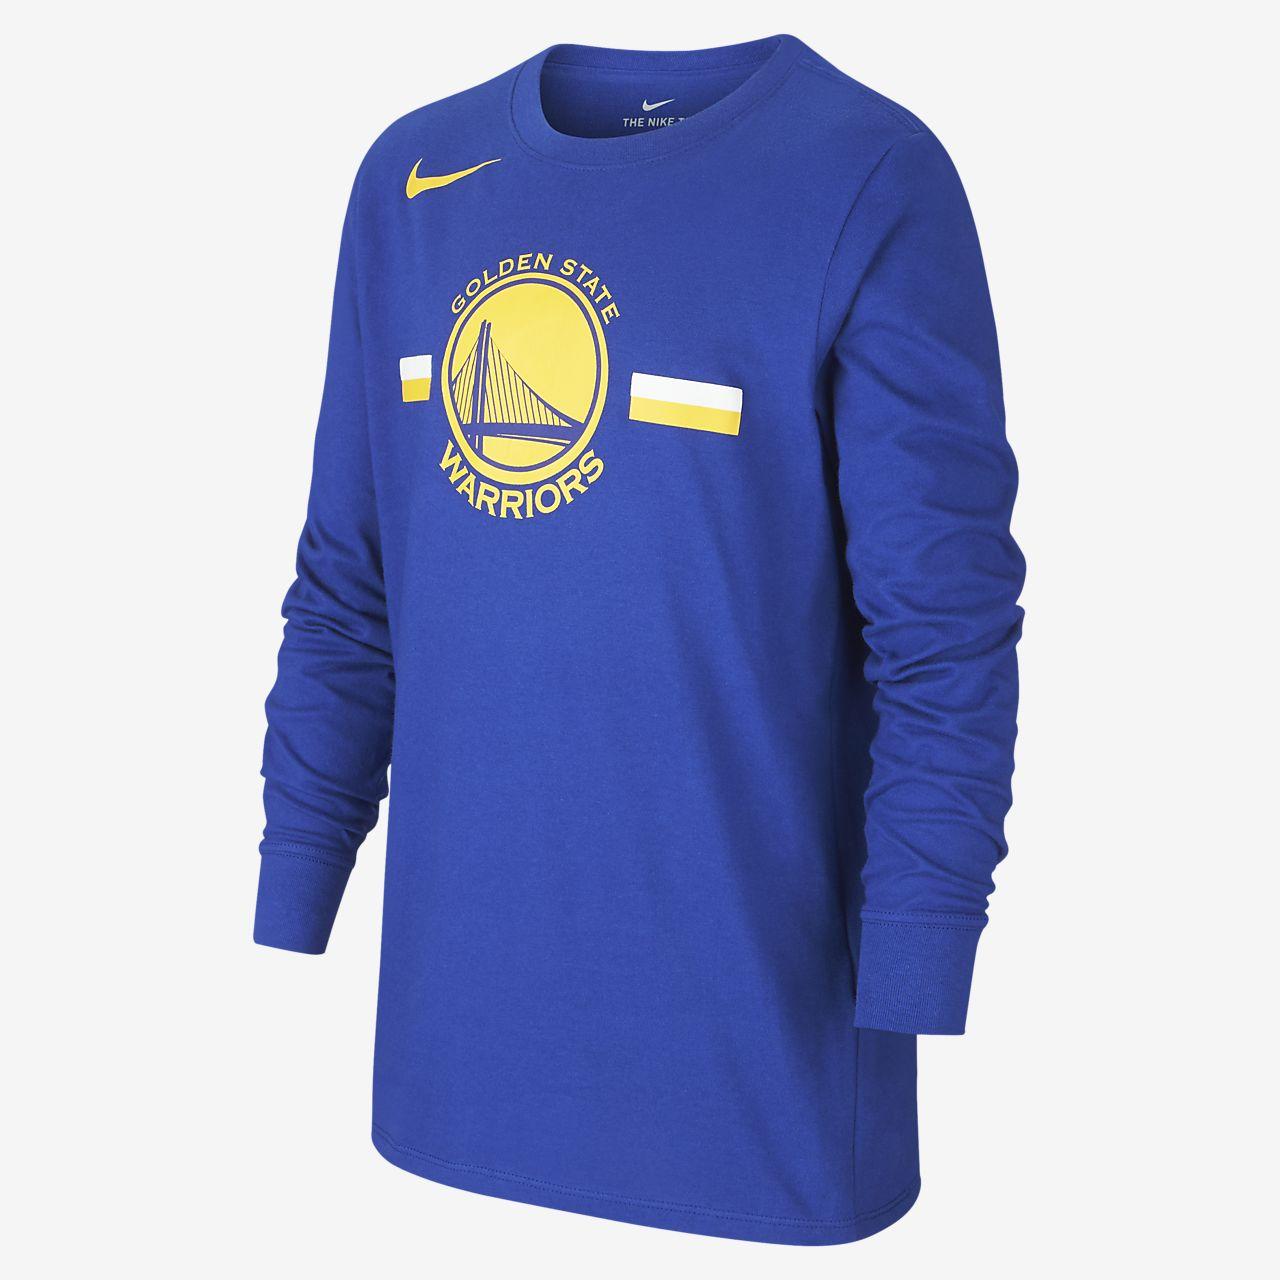 Camisola NBA de manga comprida Golden State Warriors Nike Dri-FIT Logo Júnior